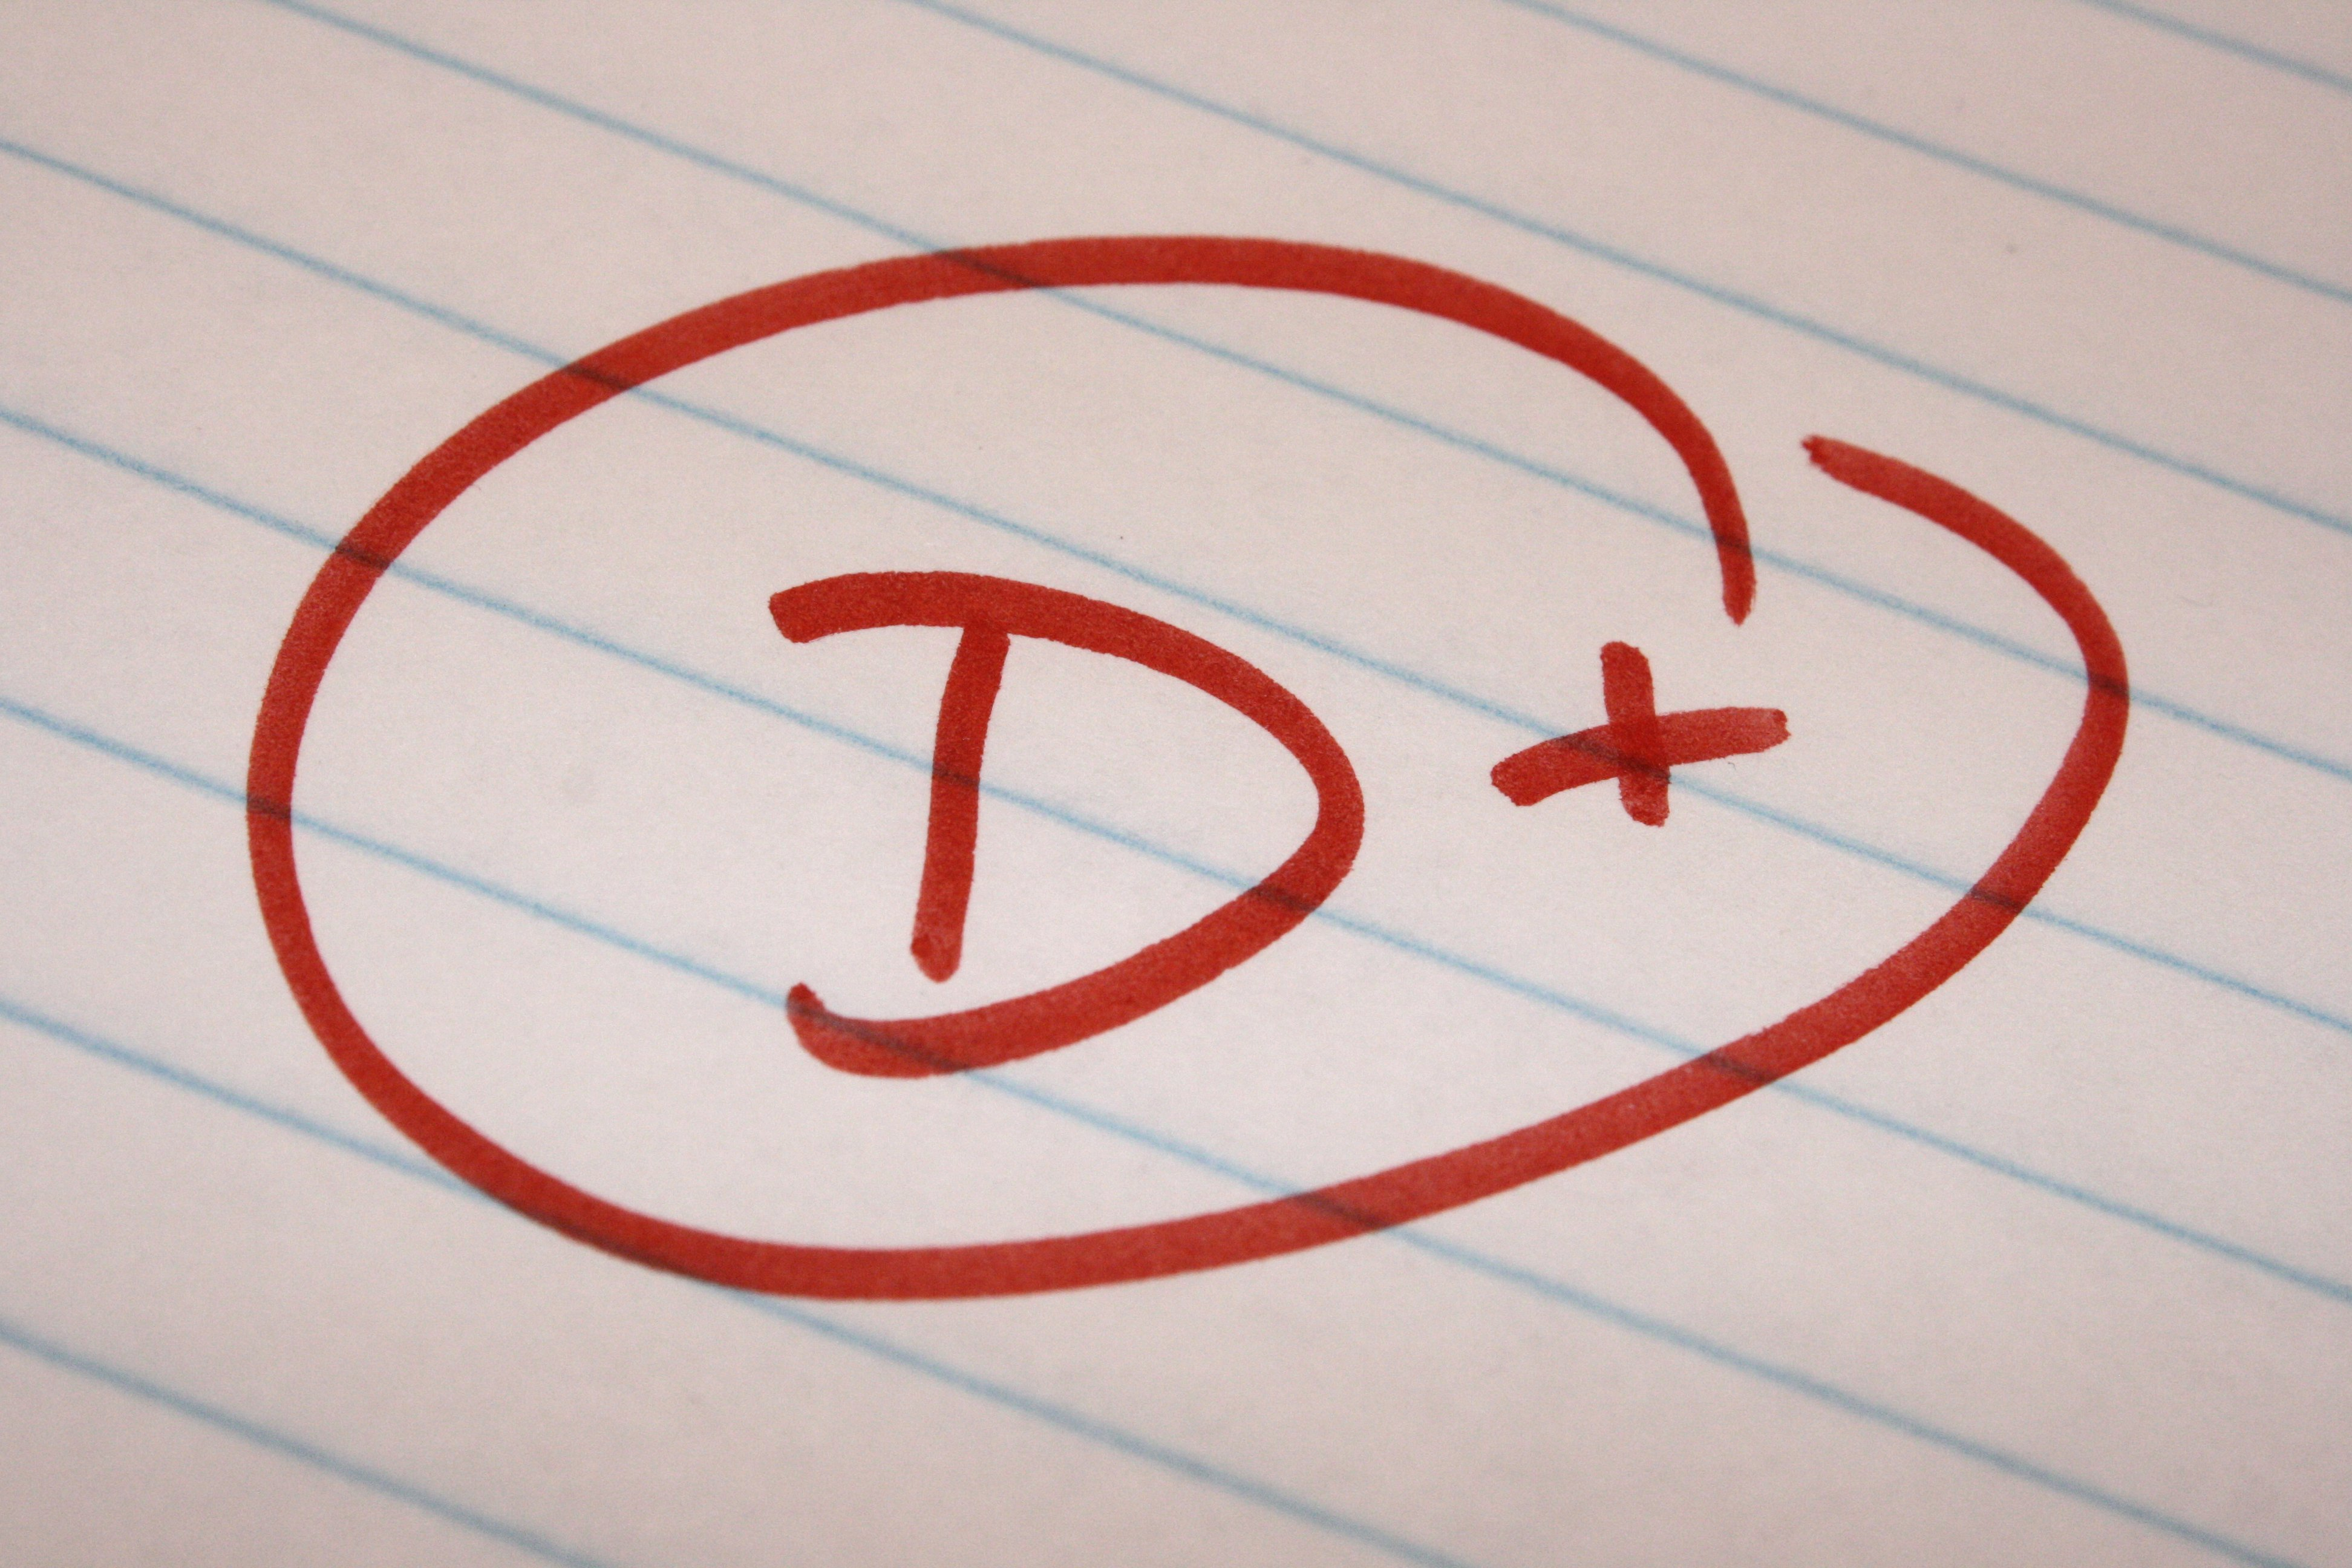 School Letter Grades d Plus School Letter Grade